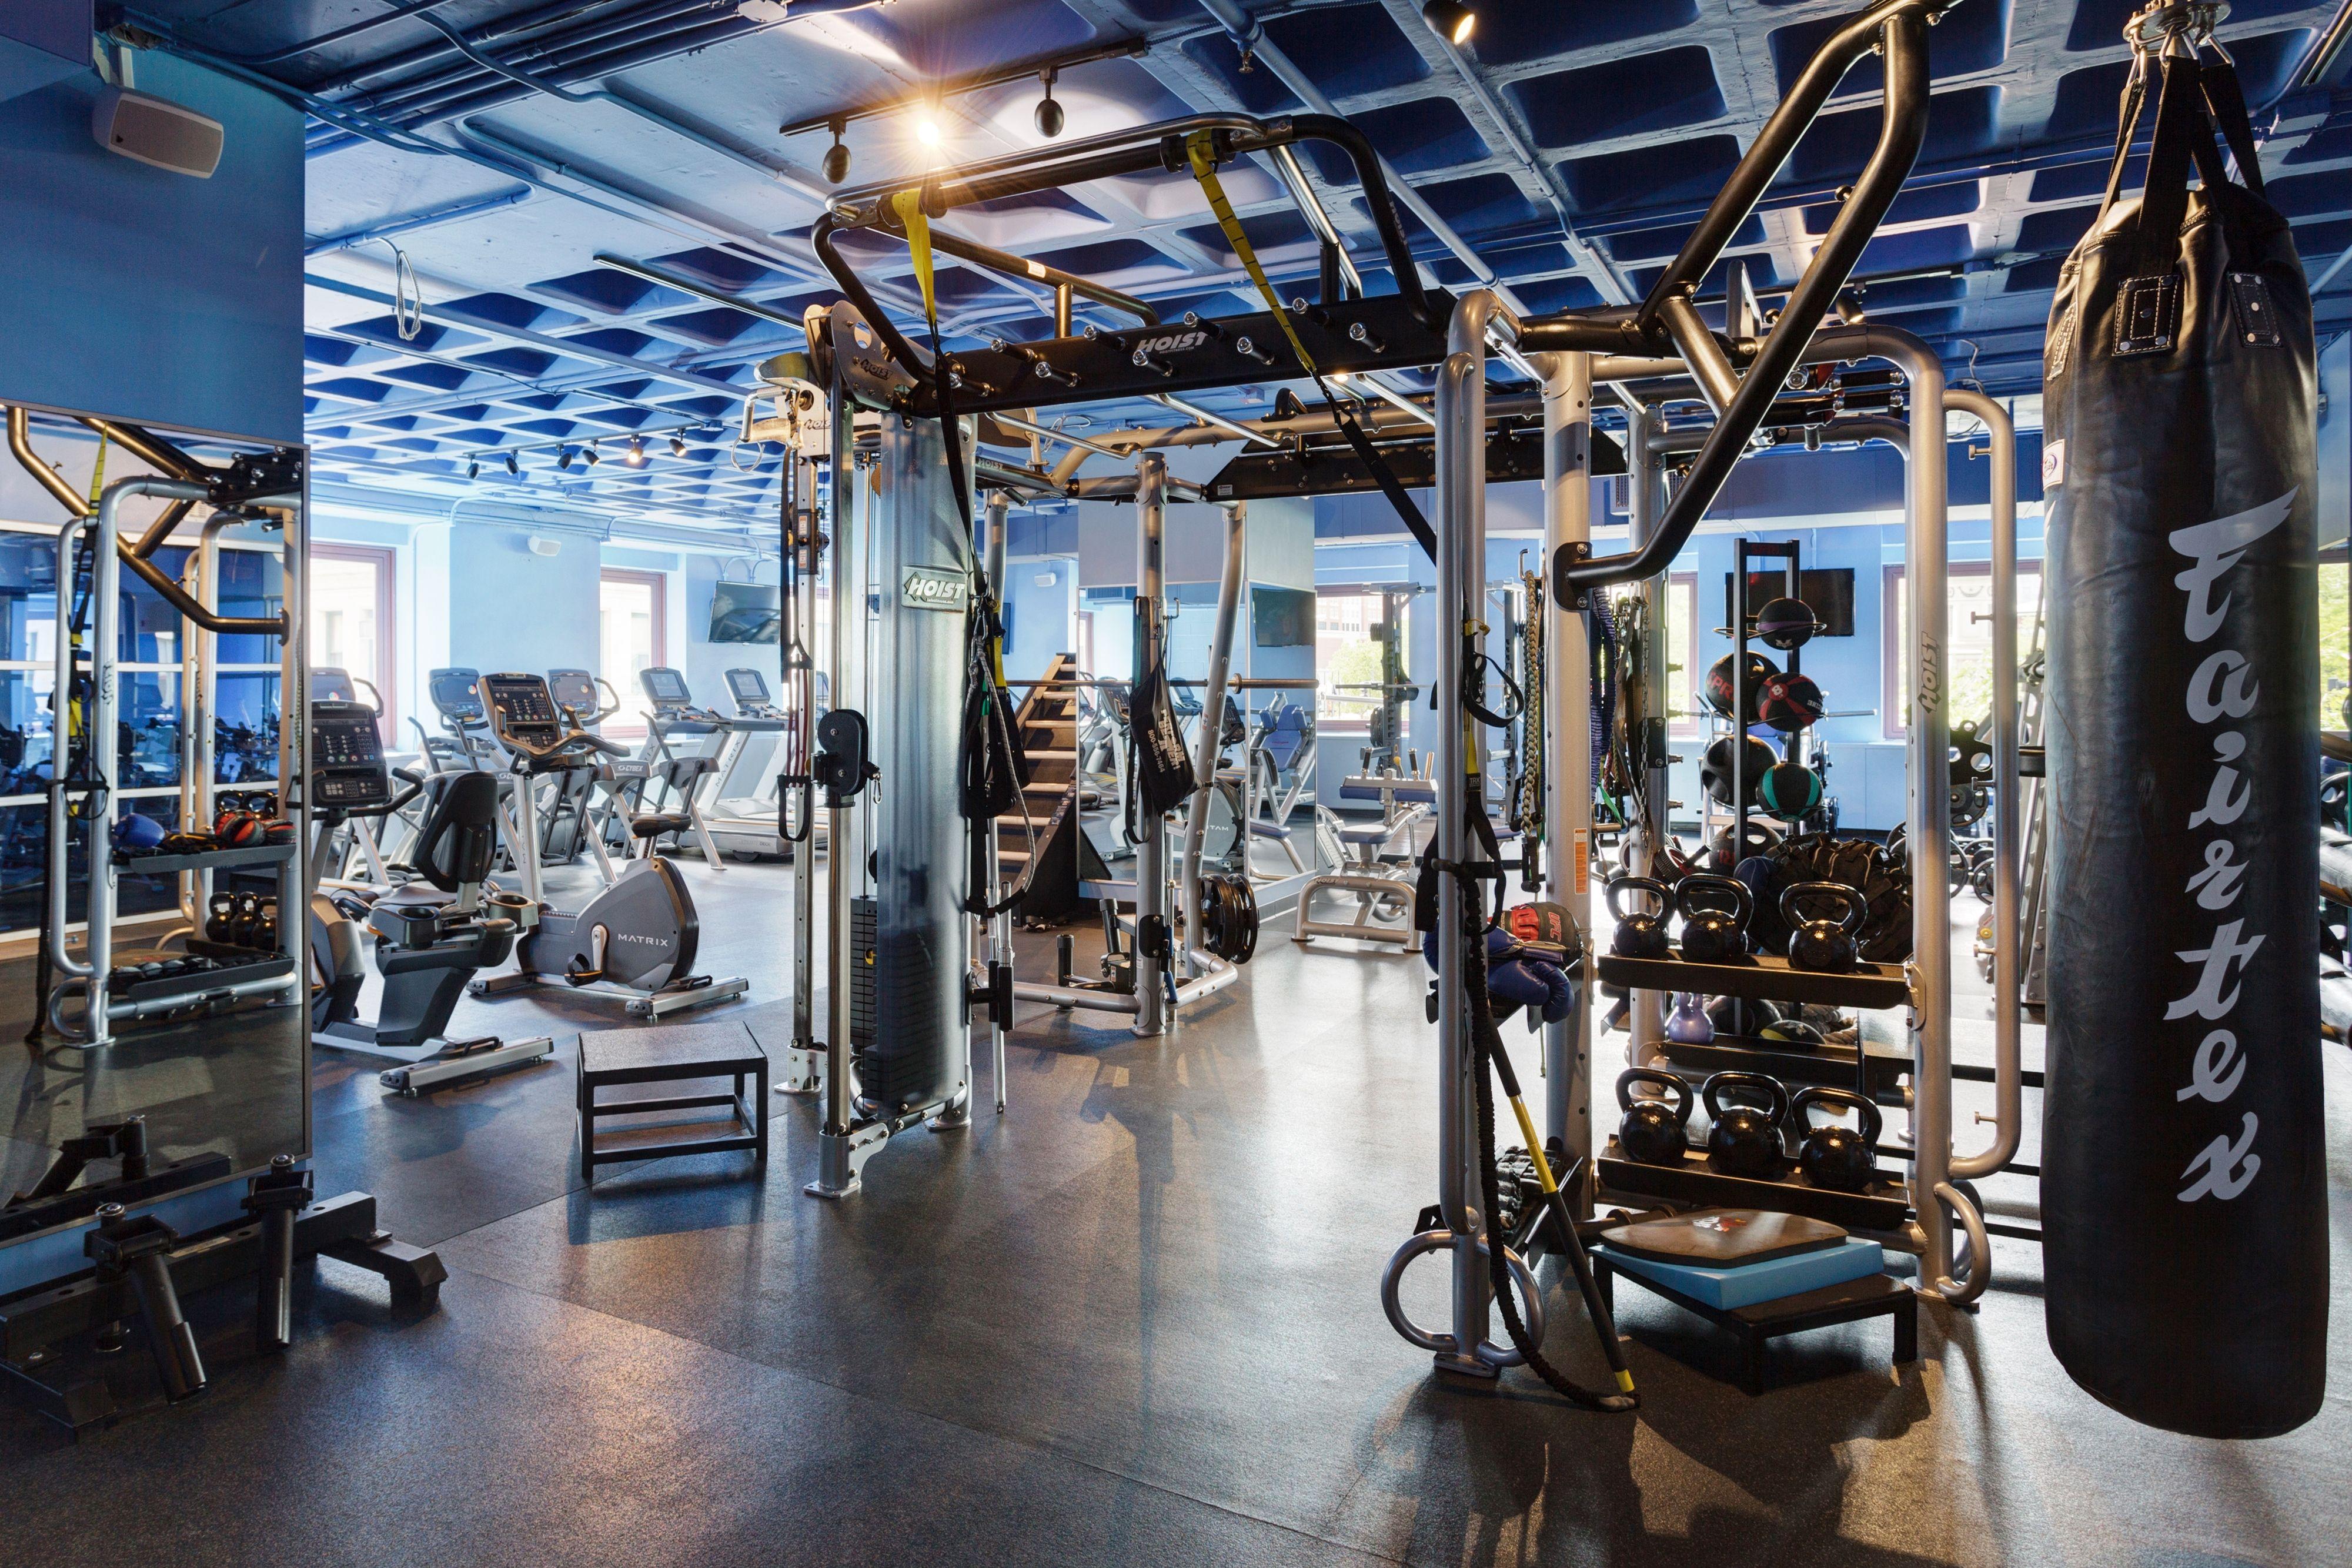 Spotlight Install Vp Fitness Providence Ri Gym Design Gym Plan Commercial Gym Design